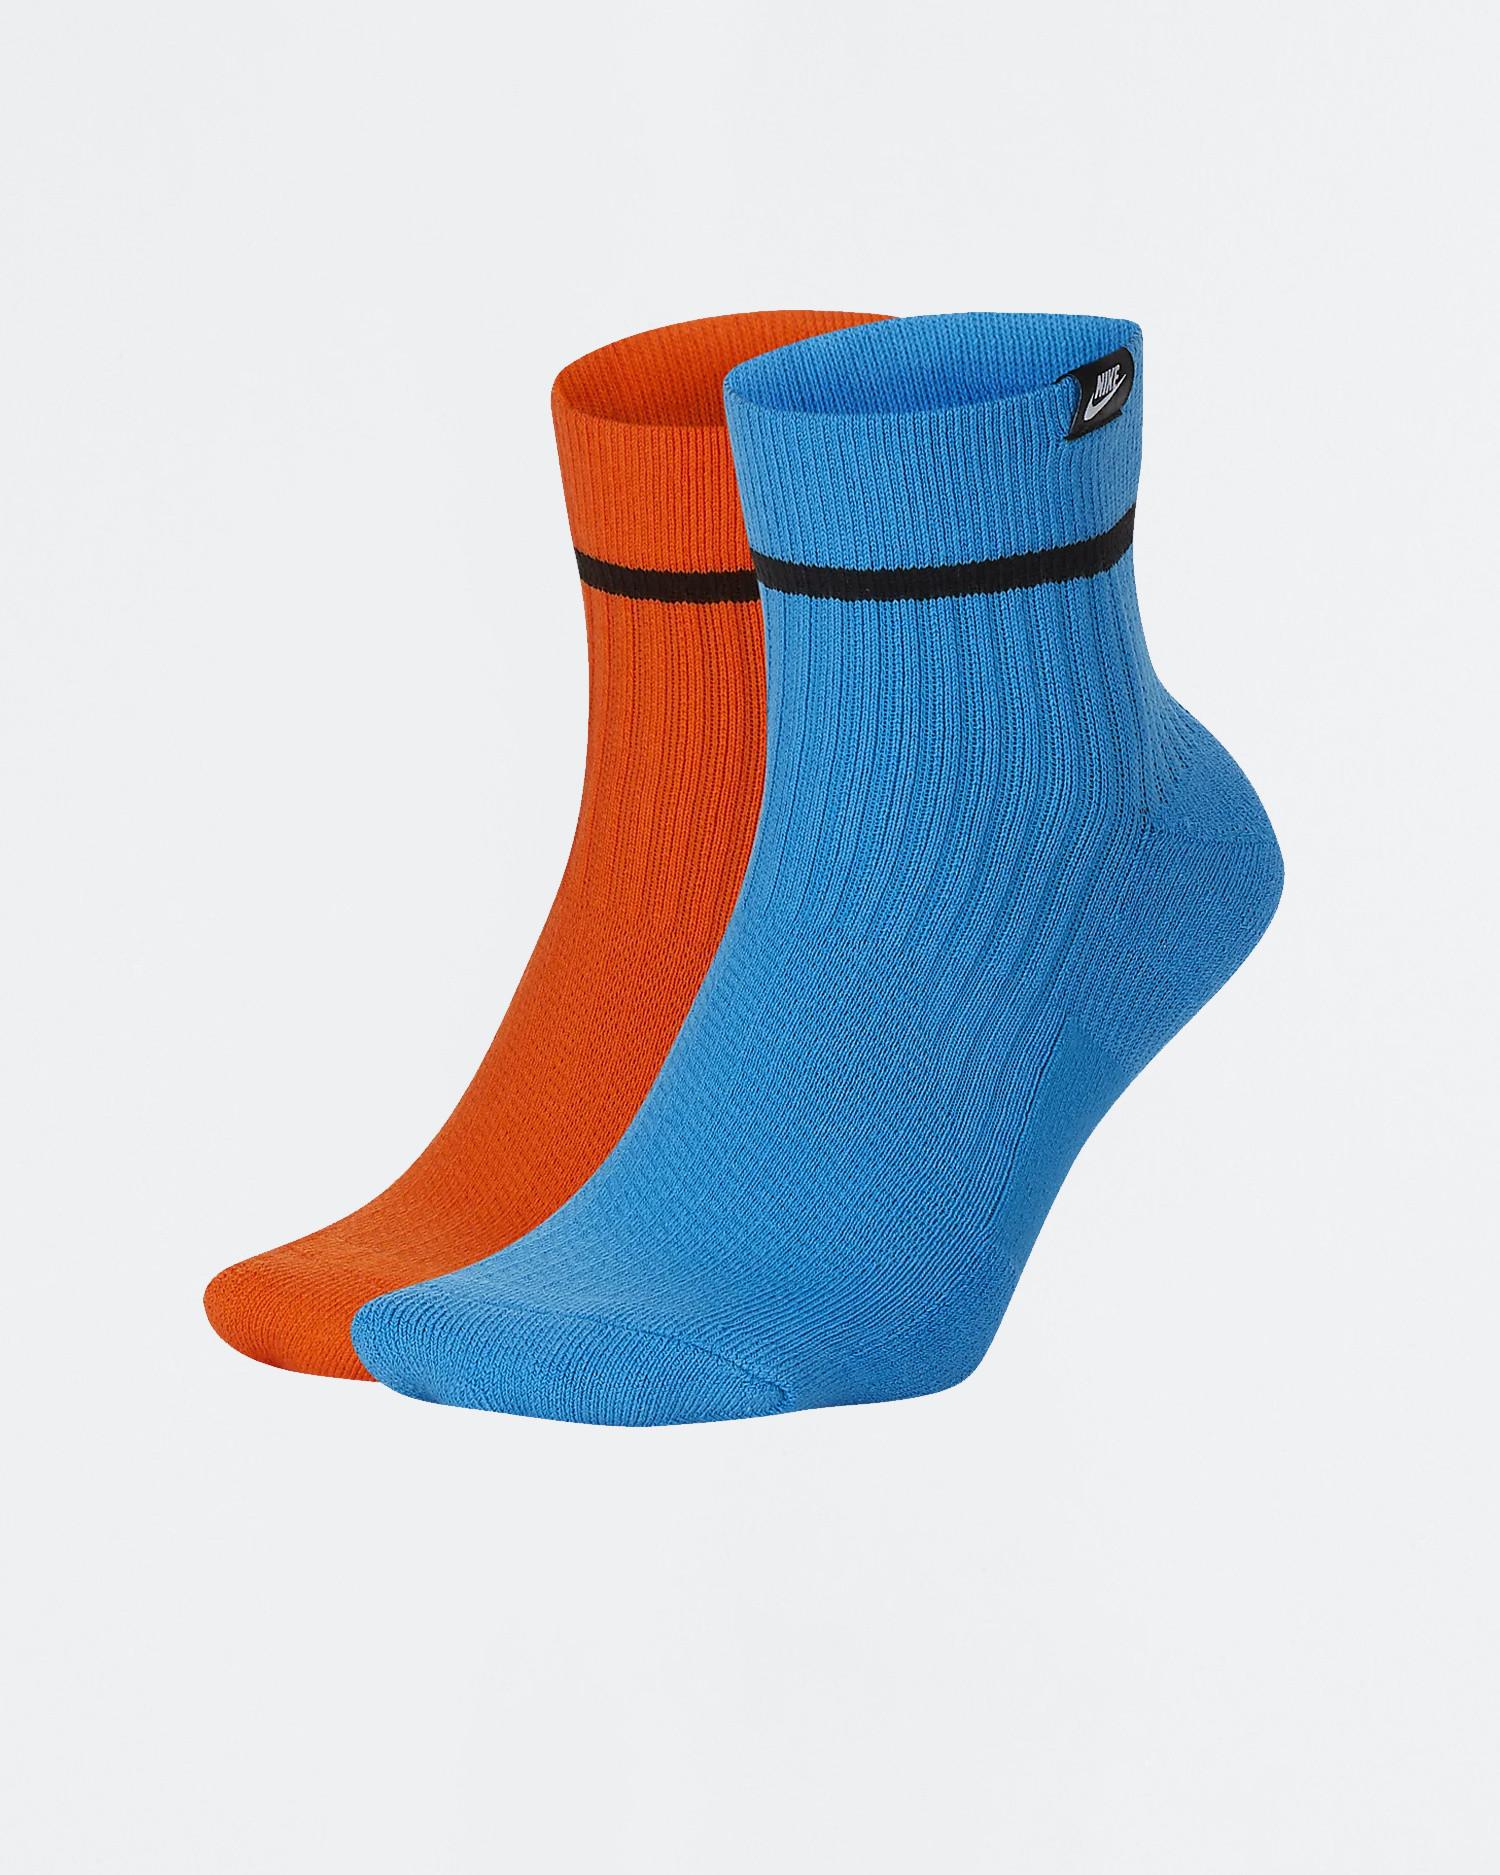 Nike 2-pack ankle sneaker sox multi color orange/blue